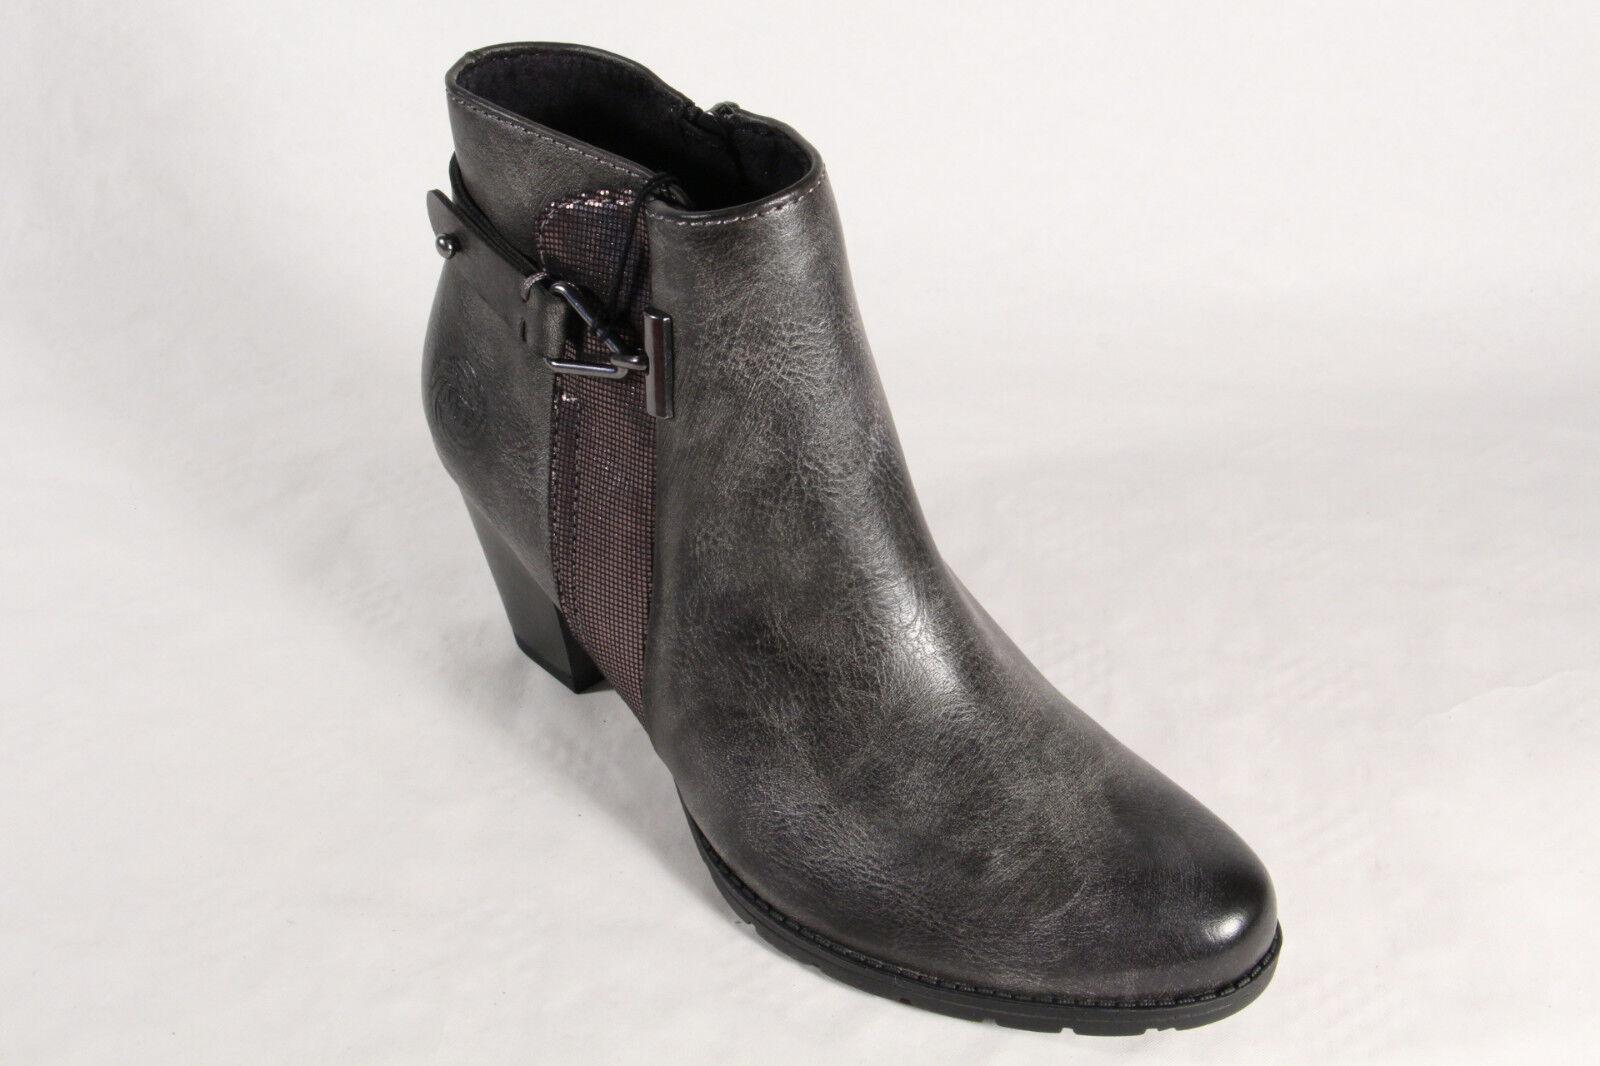 Marco Tozzi Damen Stiefel Stiefeletten NEU Schnürstiefel, Stiefel grau 25051 NEU Stiefeletten 450284